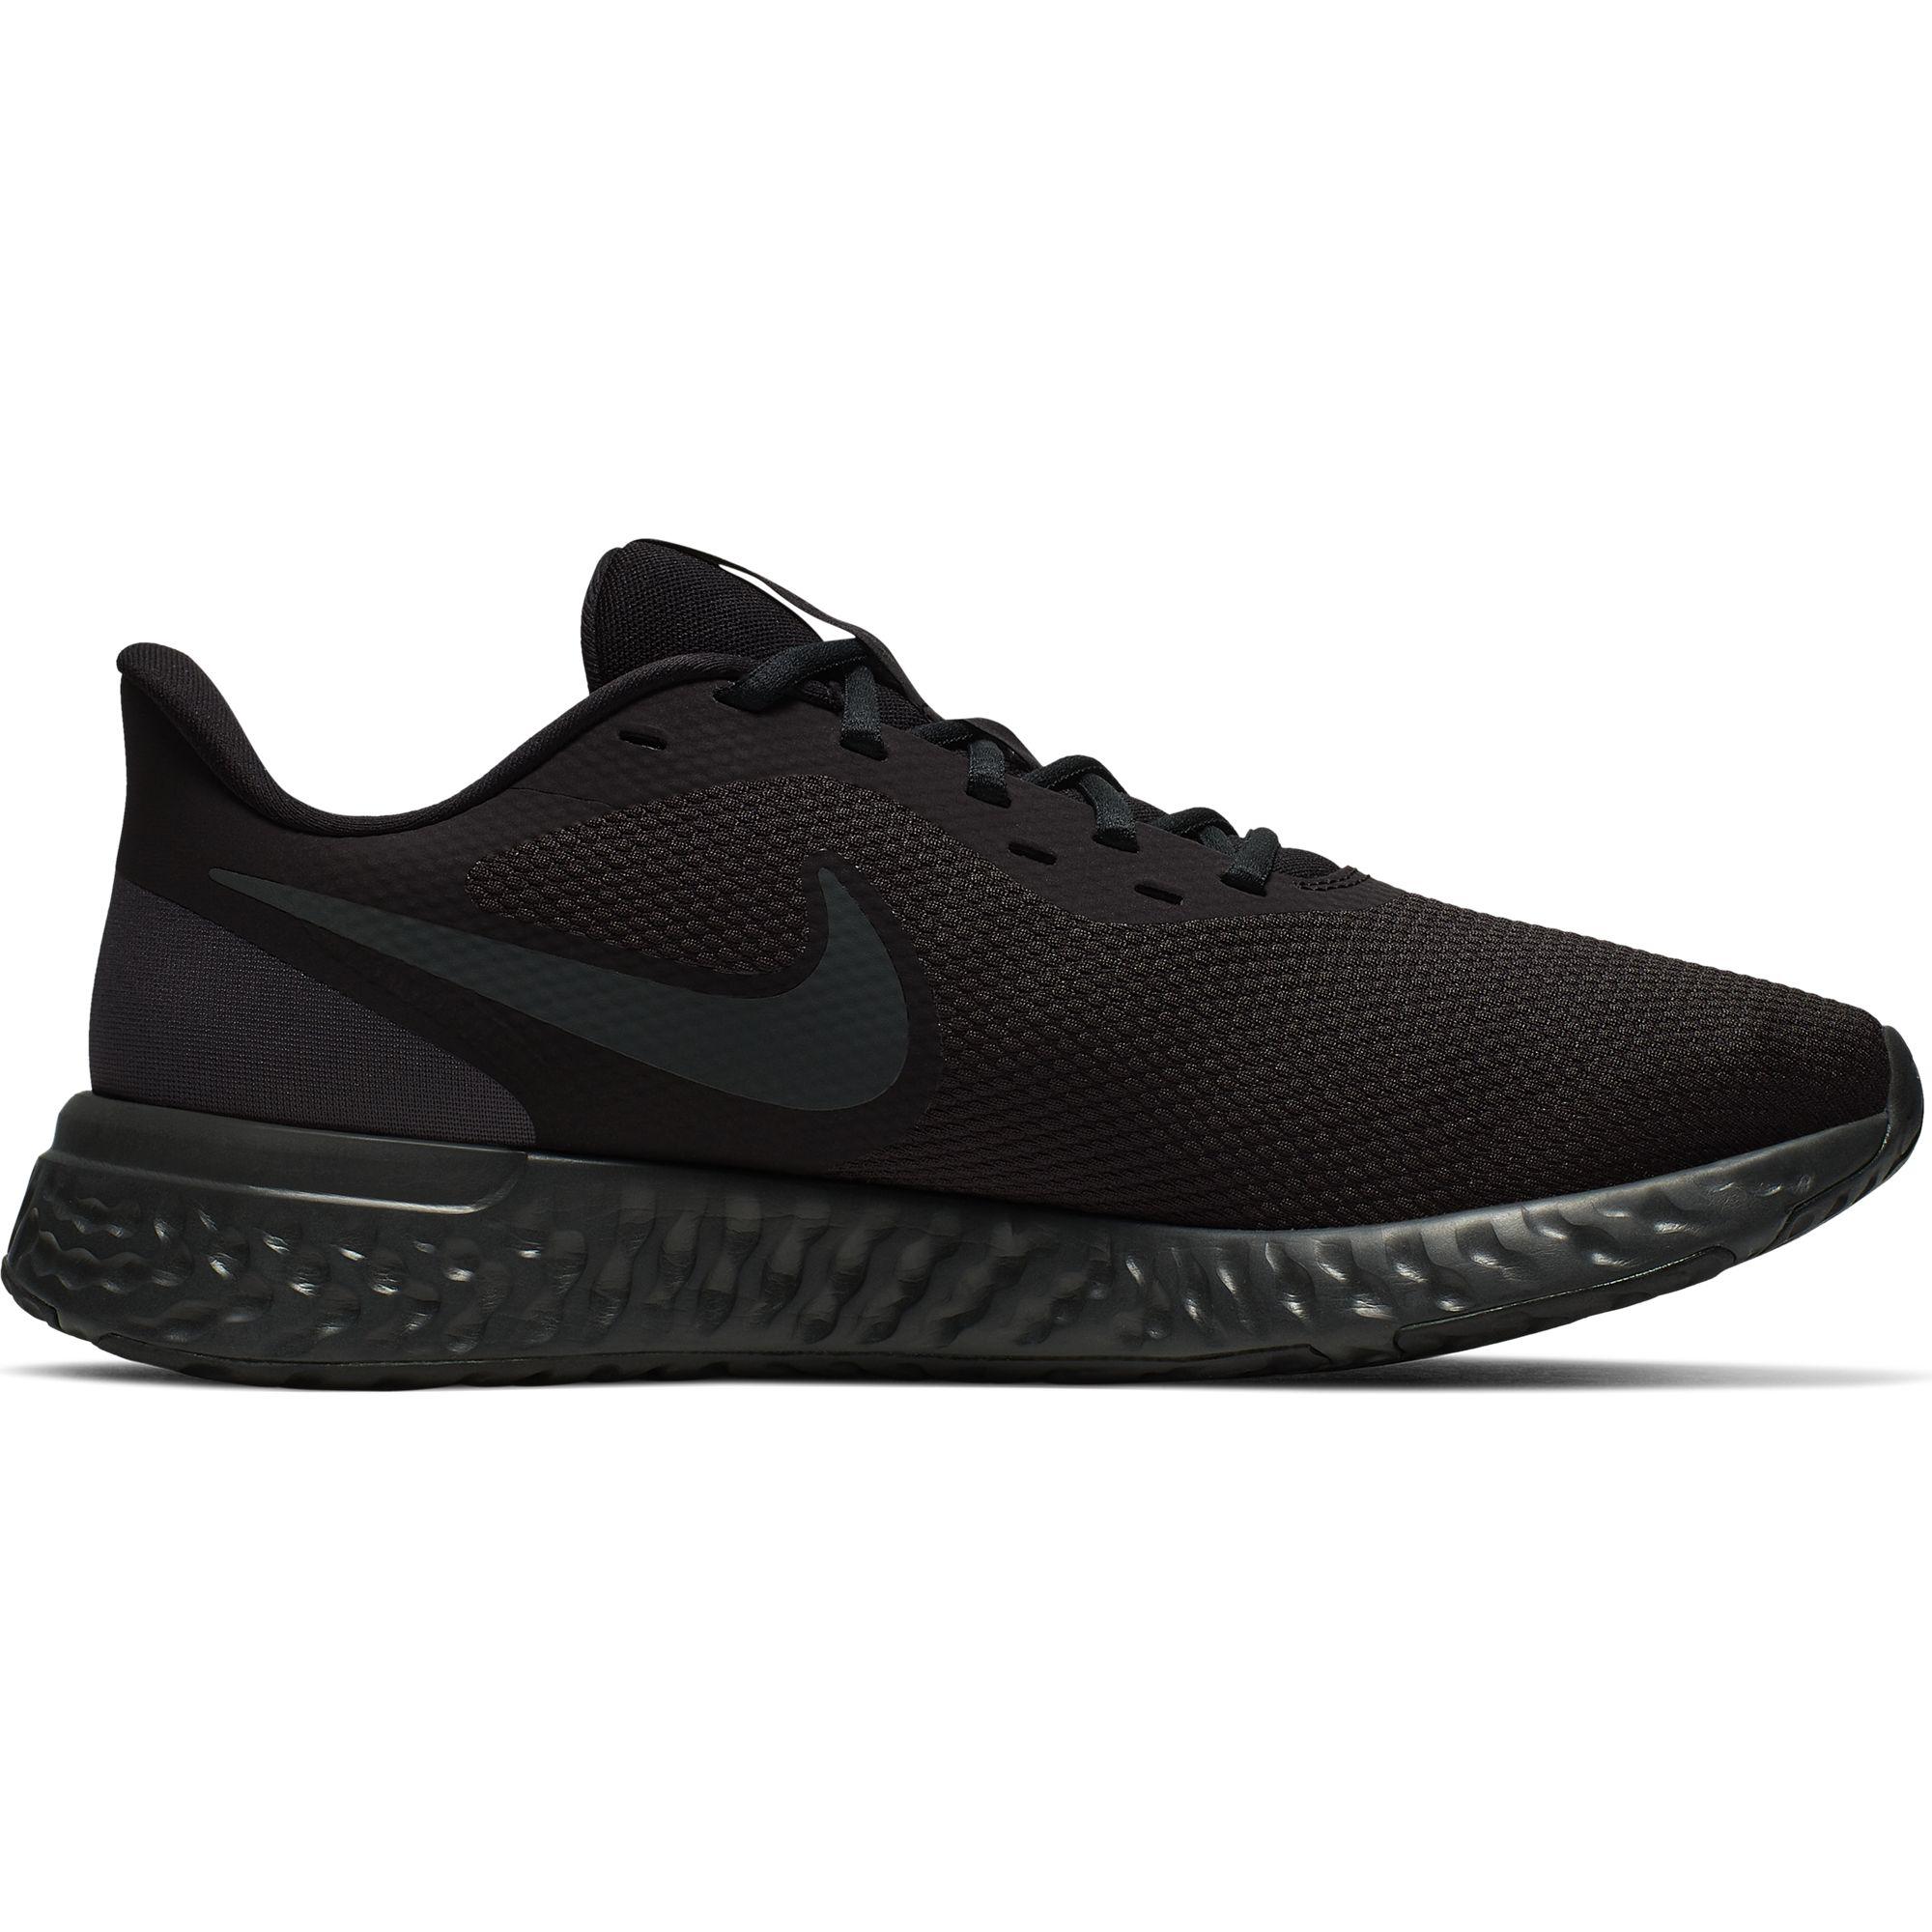 Men's Revolution 5 Running Shoes, Black, swatch